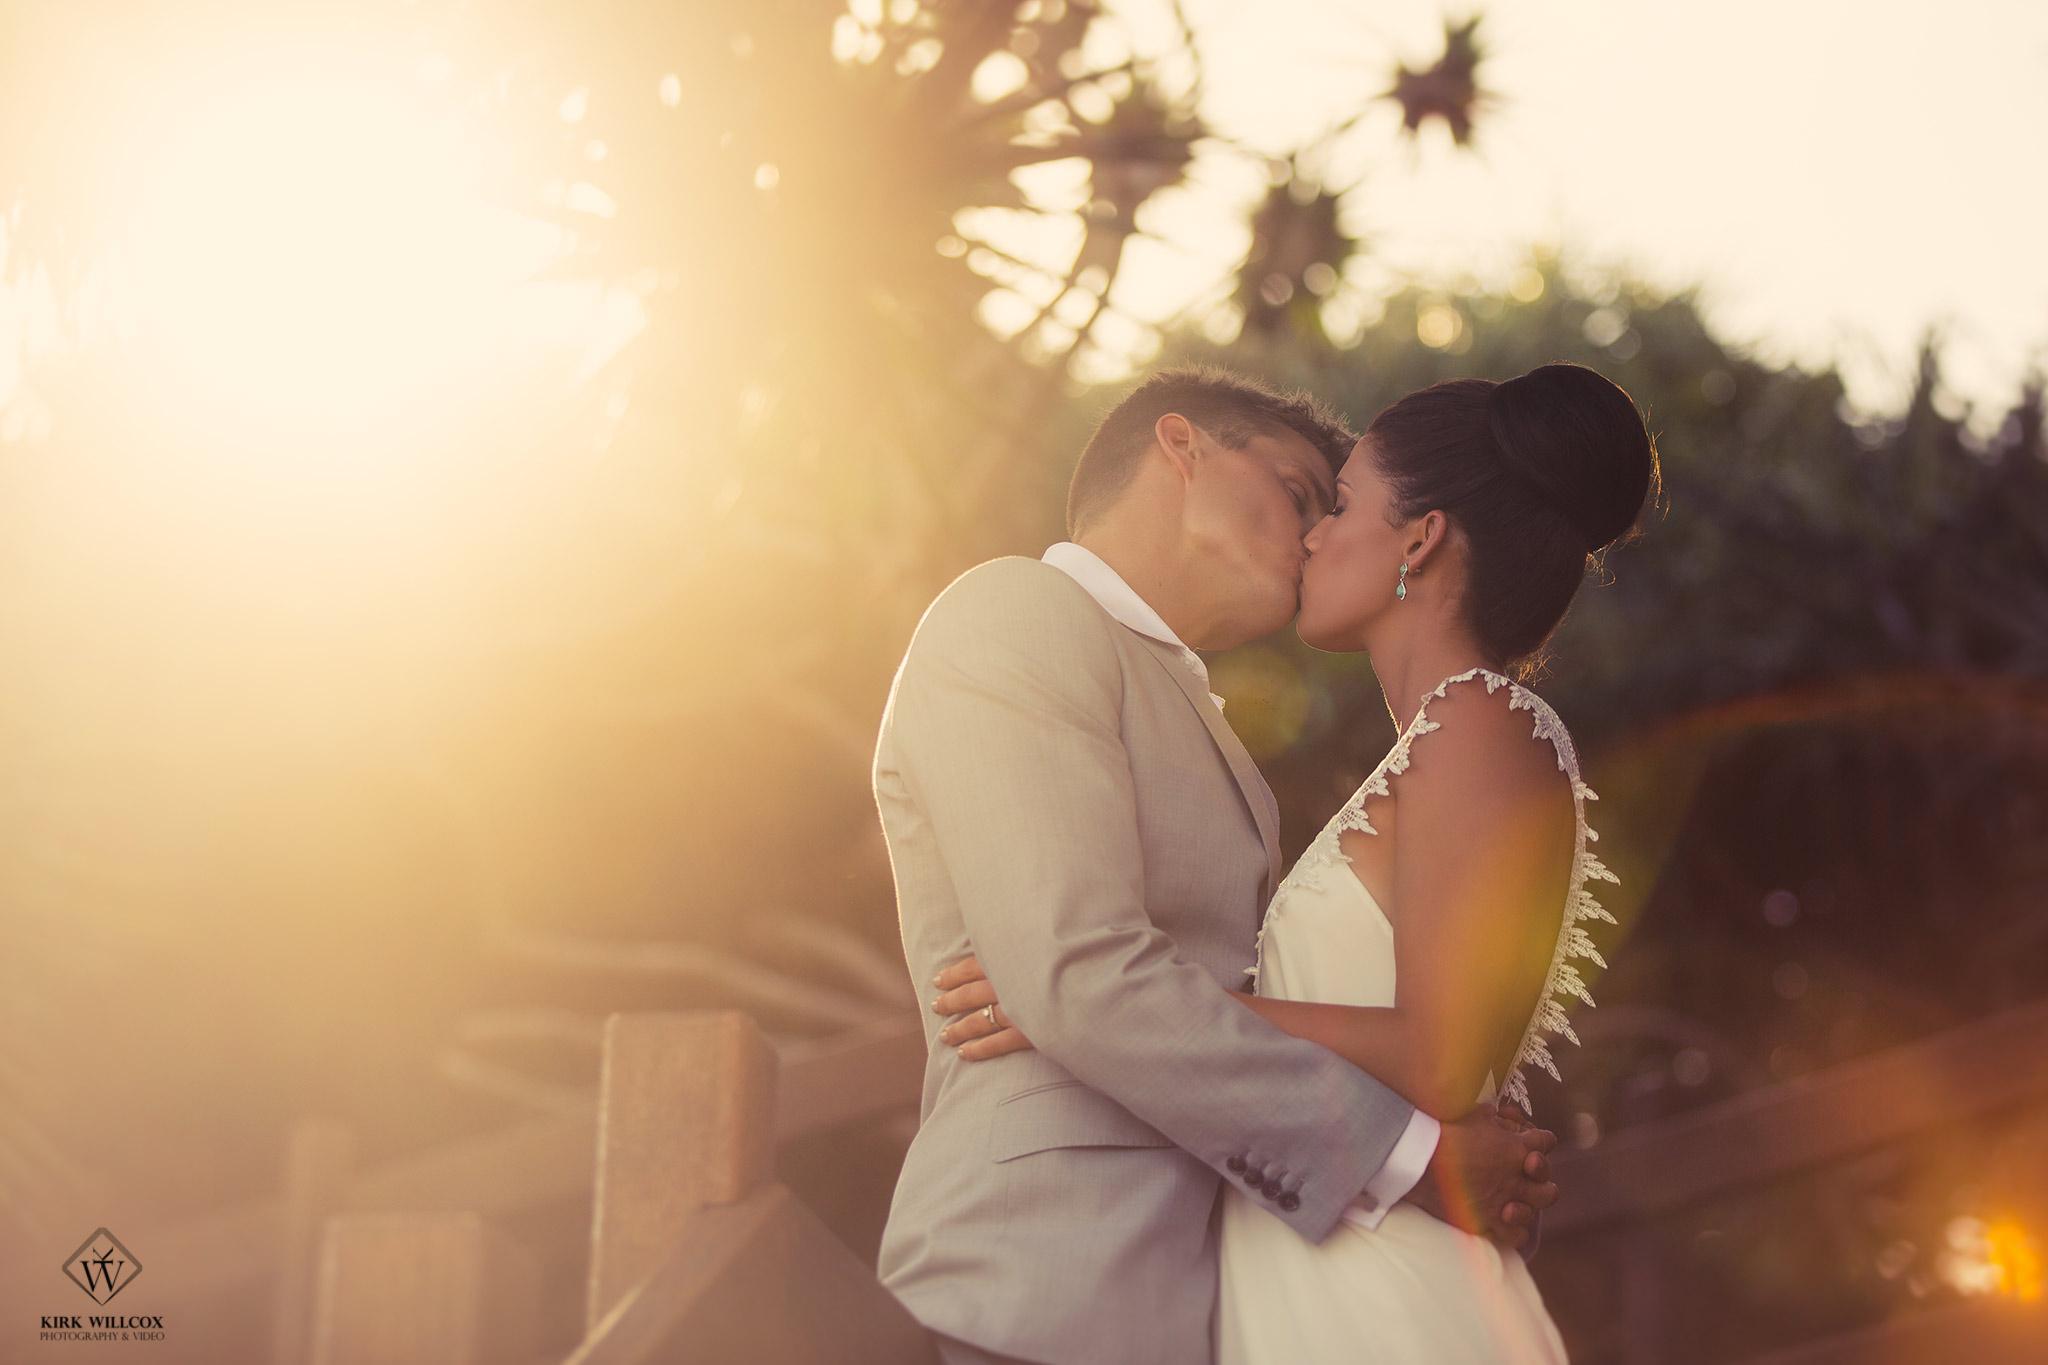 gold coast wedding photography by Kirk Willcox